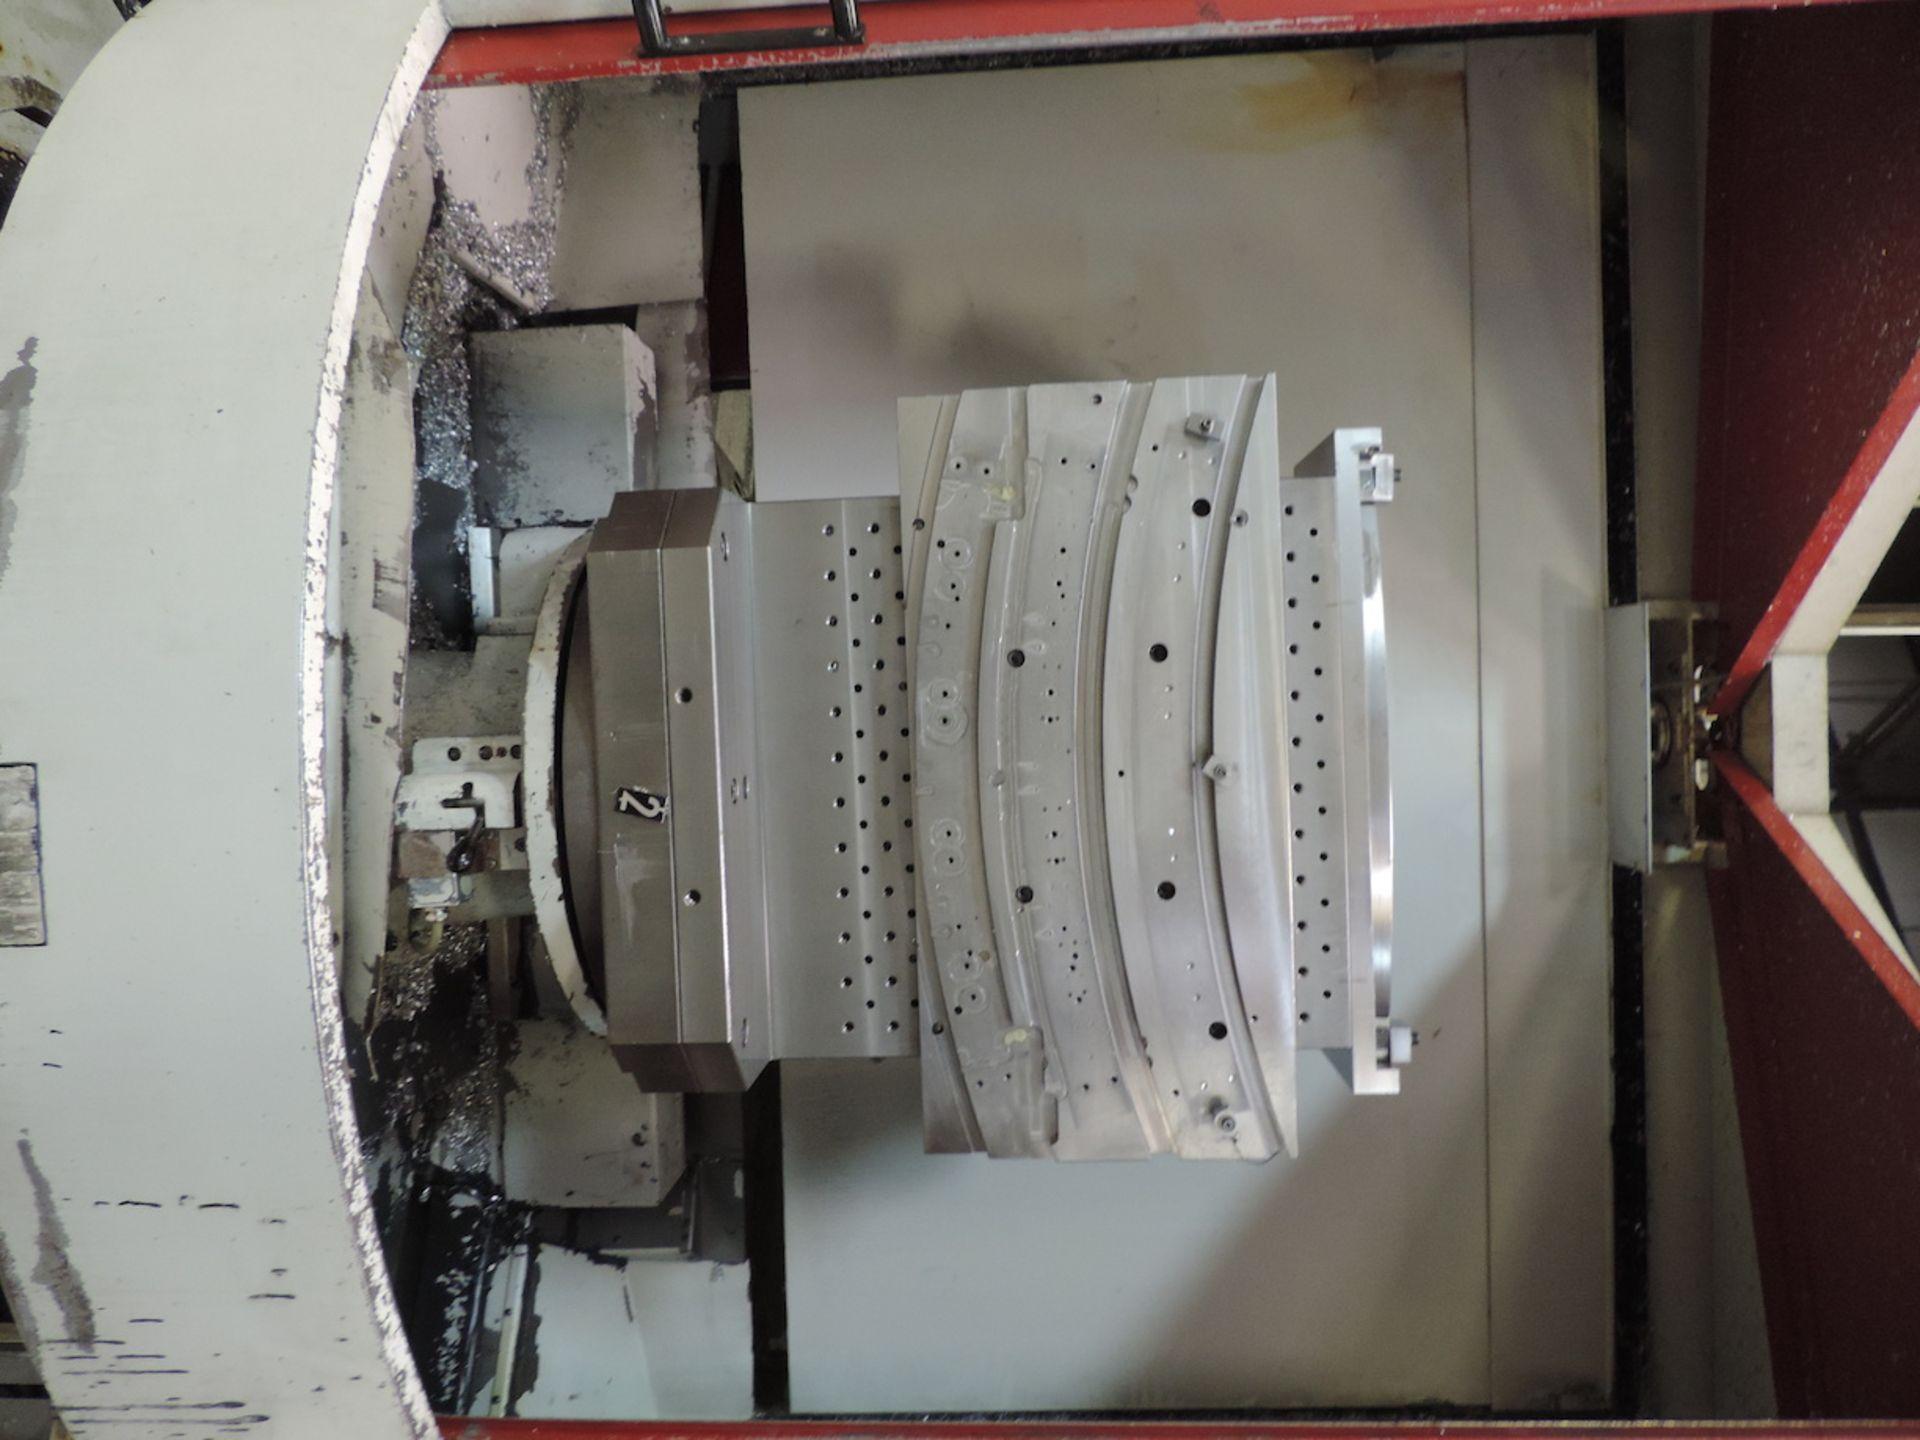 "2002 STARRAG & HECKERT CWK-630D HMC, GE FANUC 16i-M CONTROL, XYZ TRAVELS: 41"" X 39"" X 45"", 24.8"" X - Image 10 of 20"